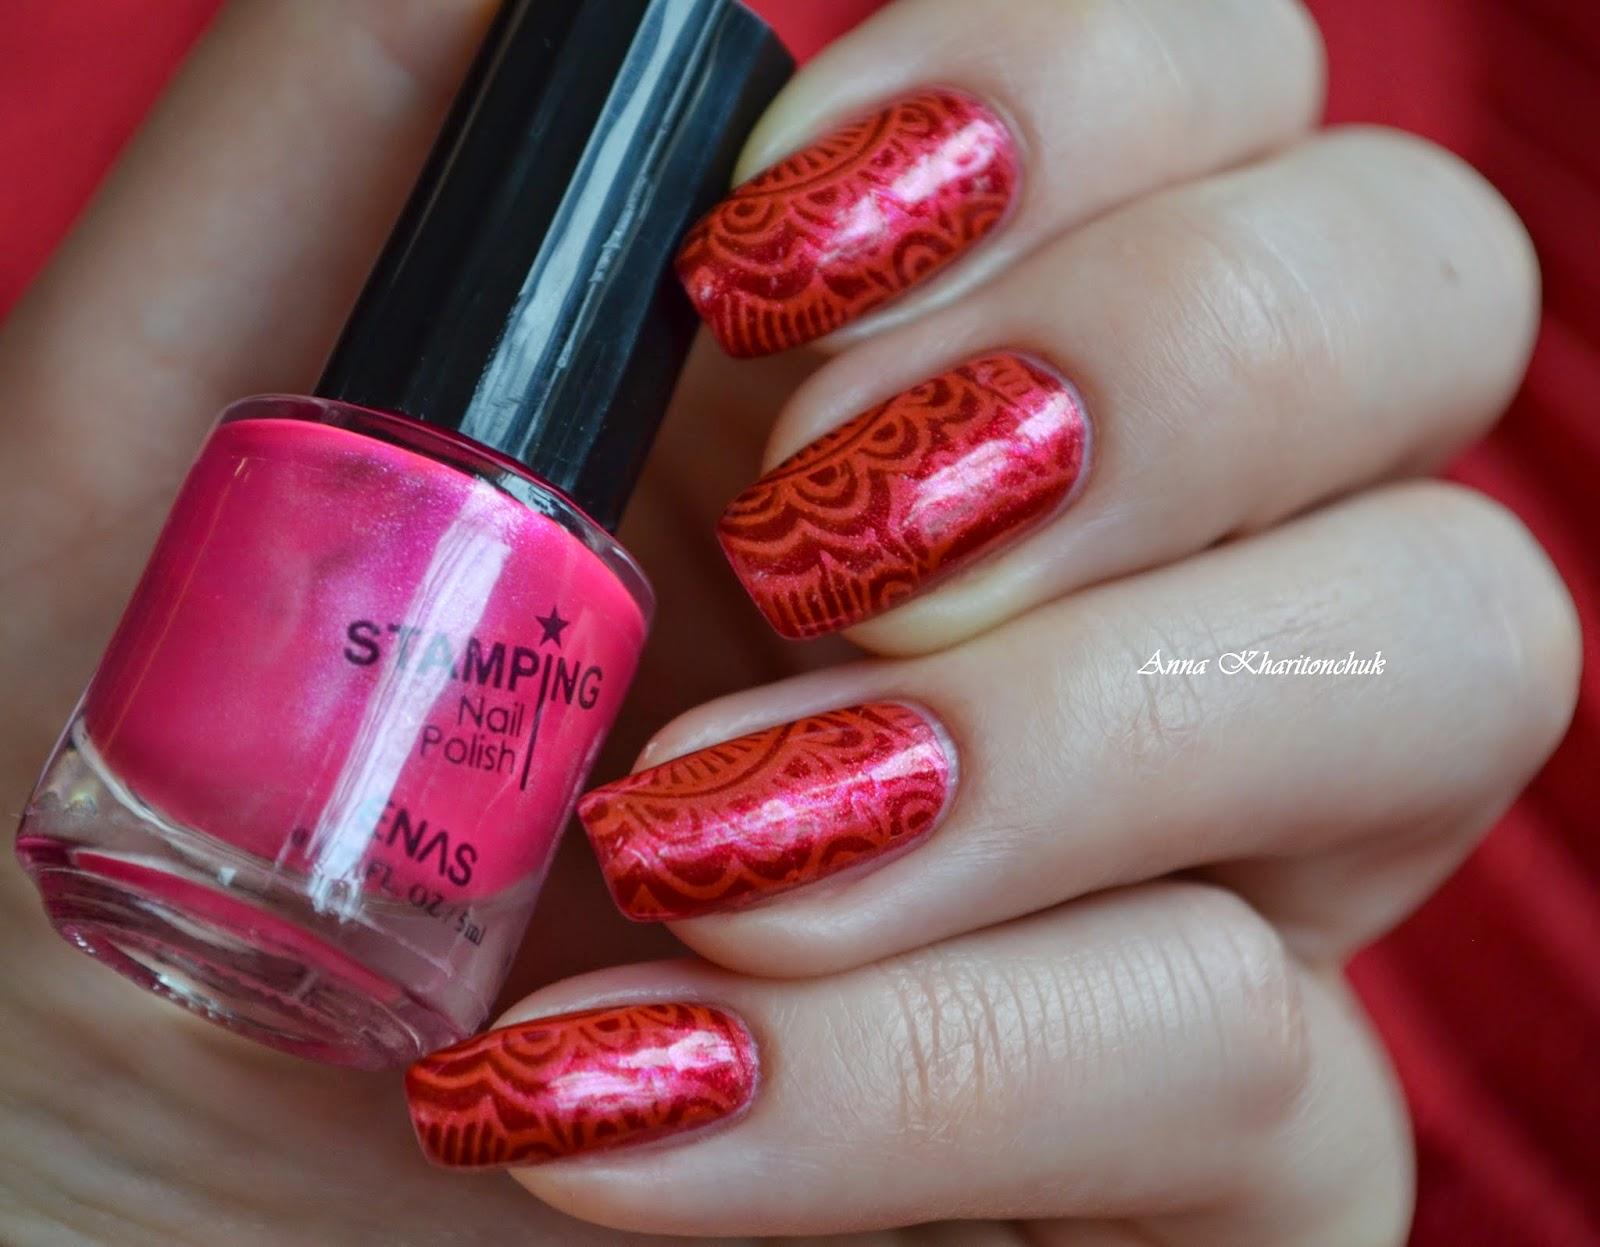 Sally Hansen Complete Salon Manicure # 707 Scarlet Letter, лак для стемпинга Enas и плитка BP-31